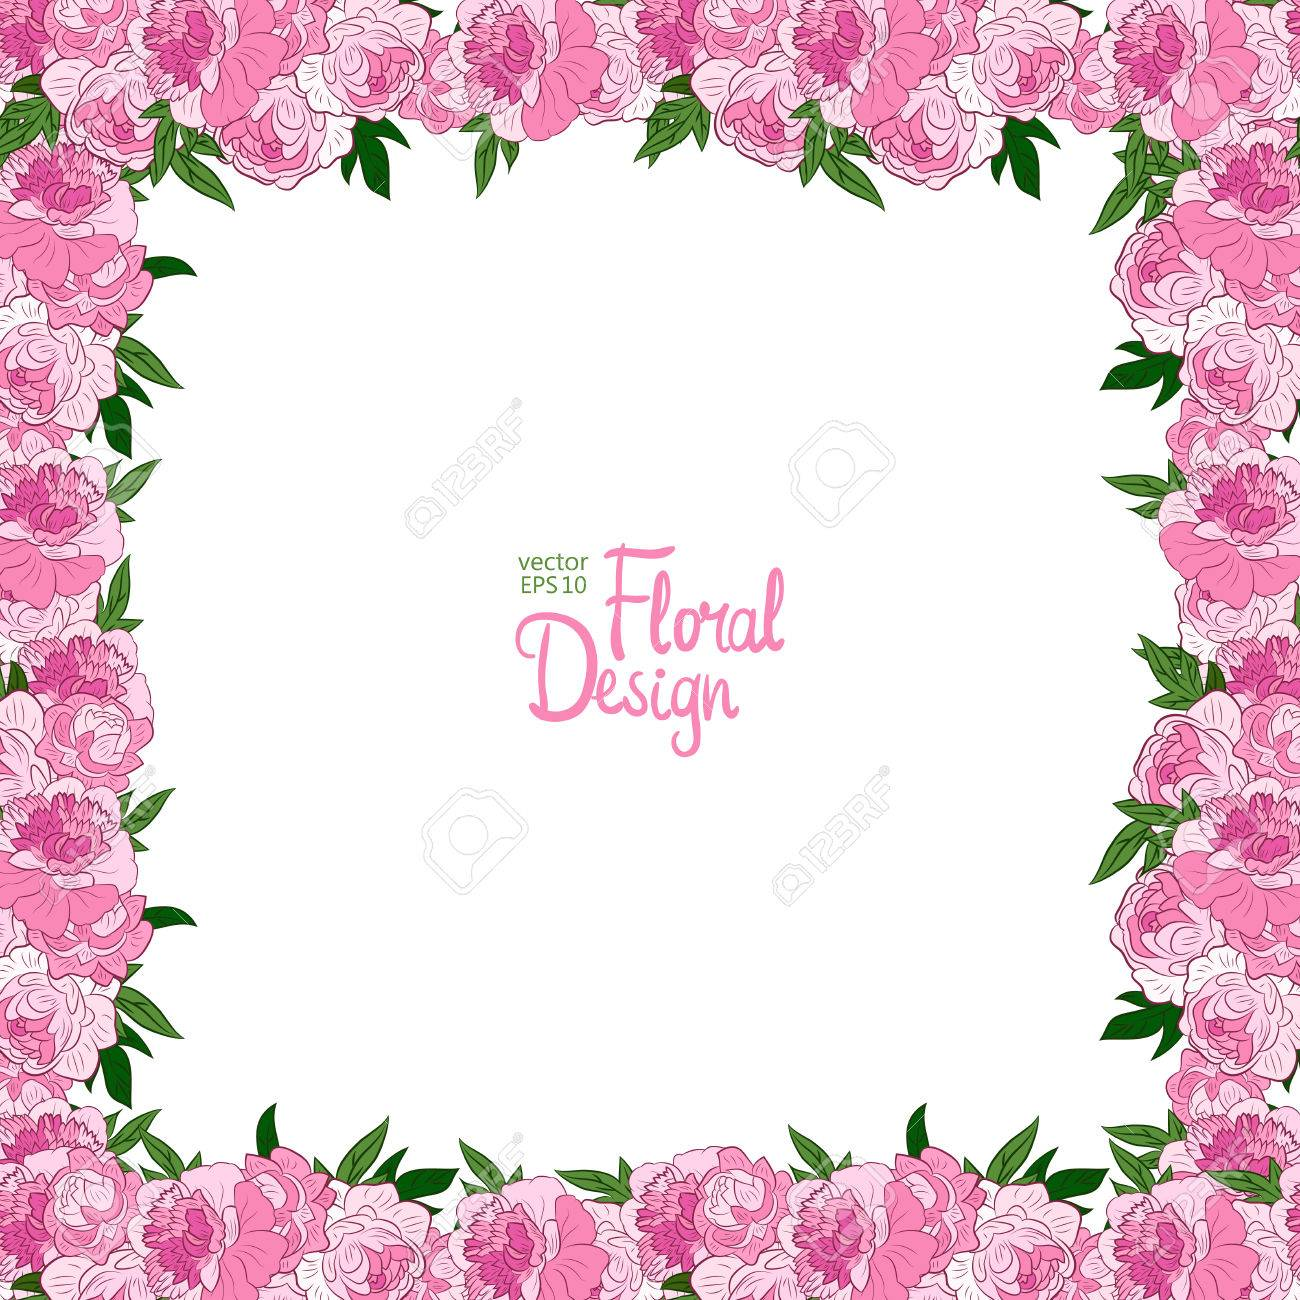 The Pink Peonies the pink peonies - pueblosinfronteras